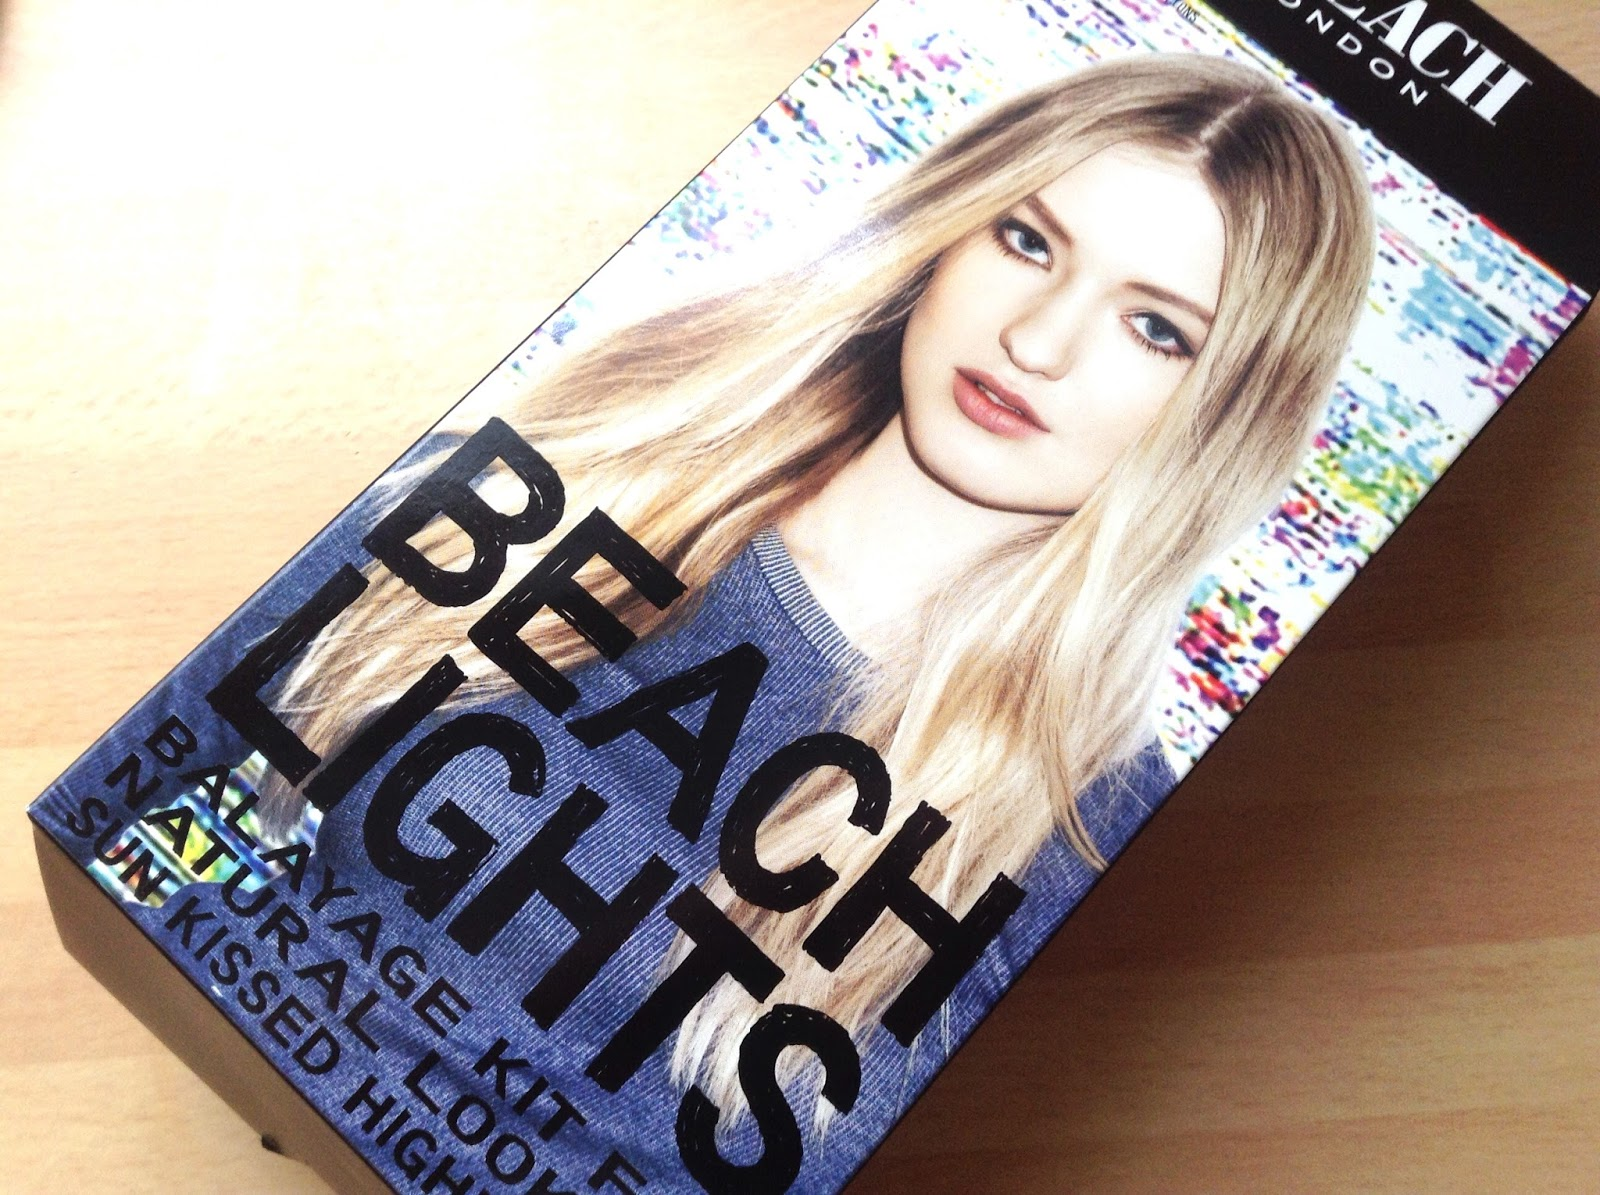 Bleach London Balayage Beach Lights Kit Review  Results.